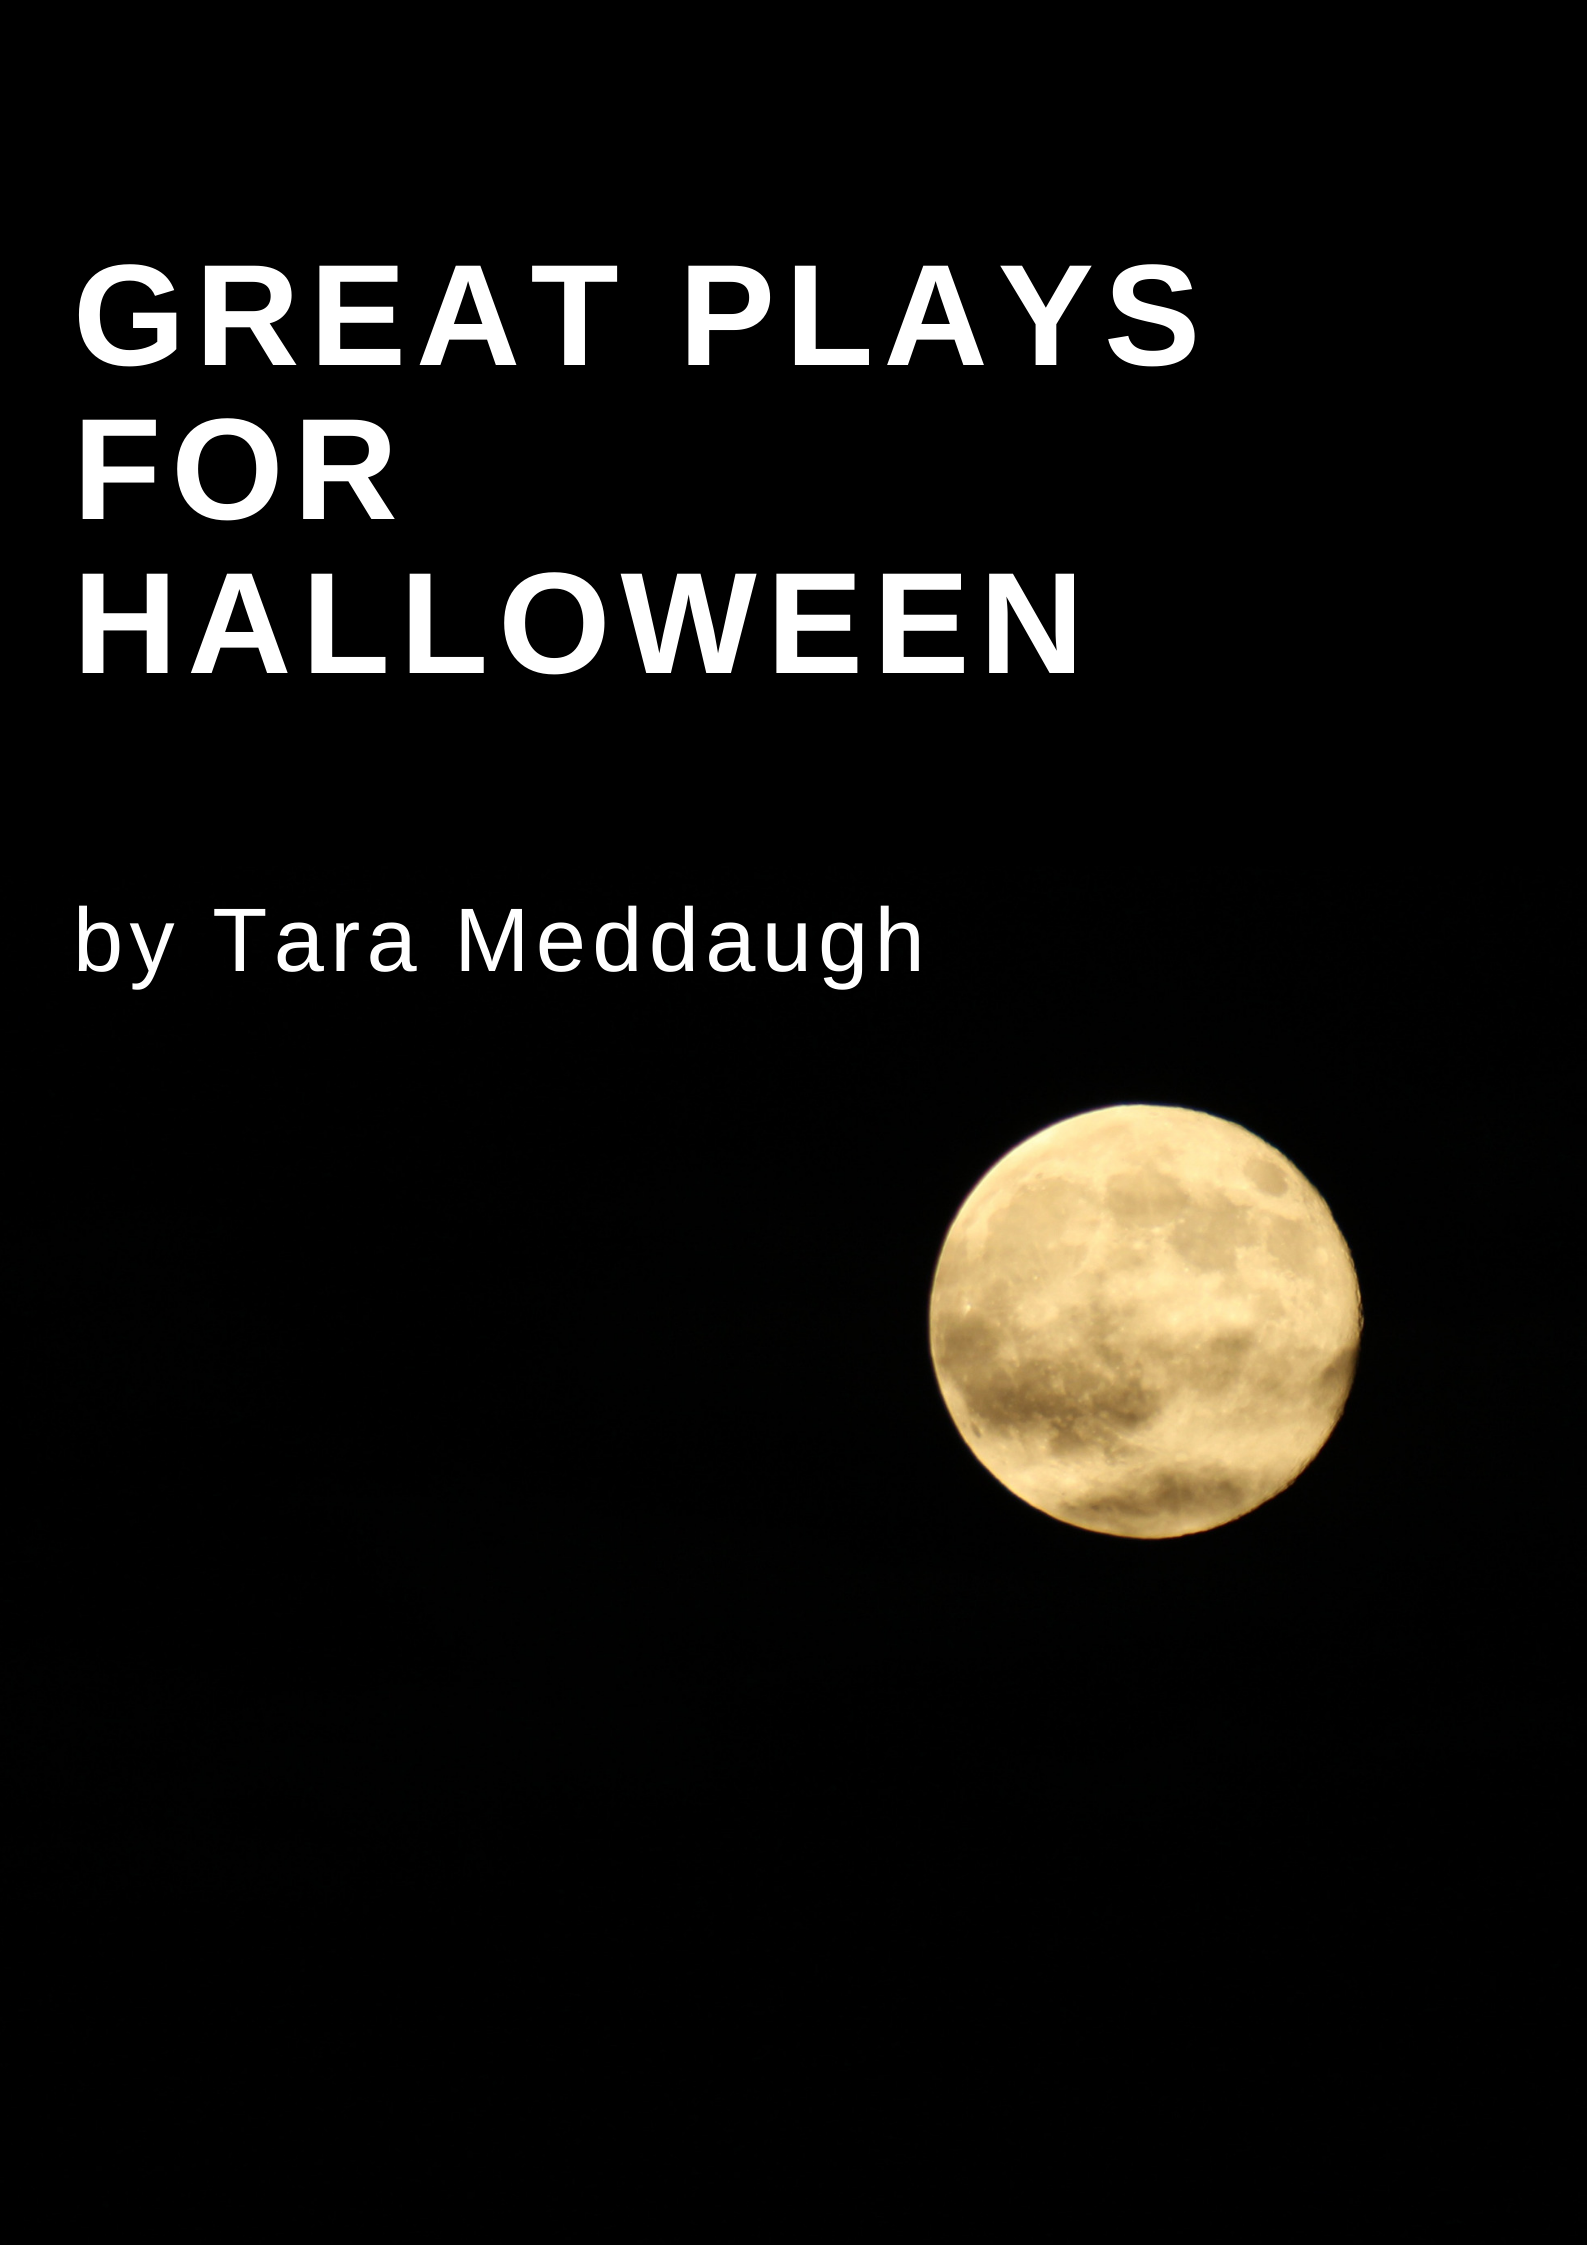 halloween plays.png